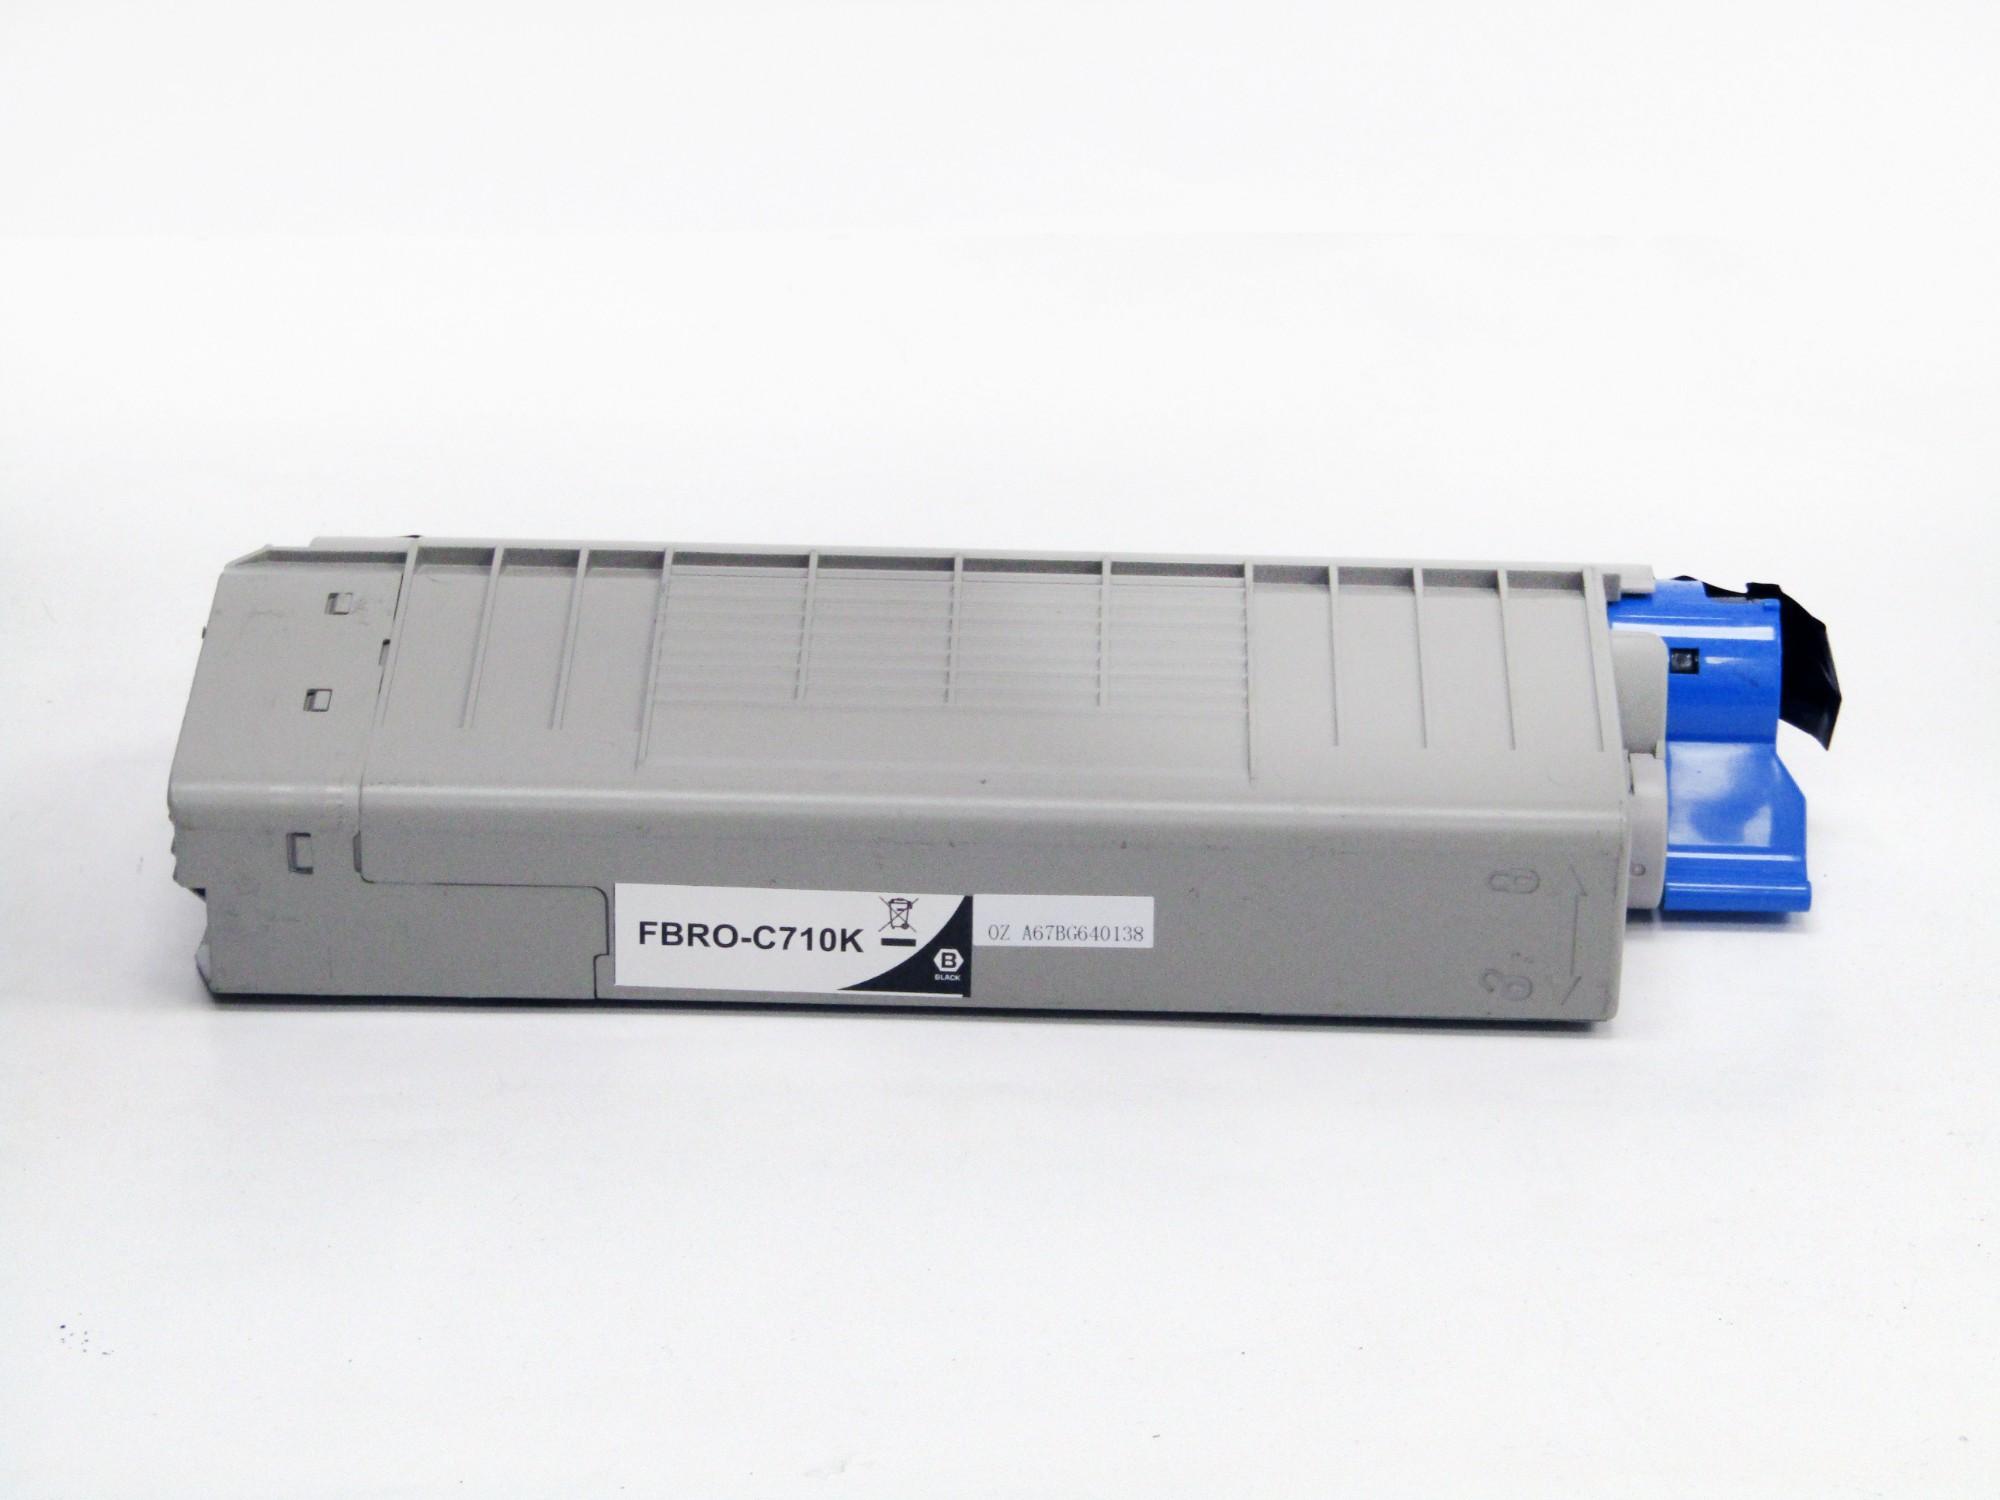 Remanufactured OKI 44318108 Black Toner Cartridge